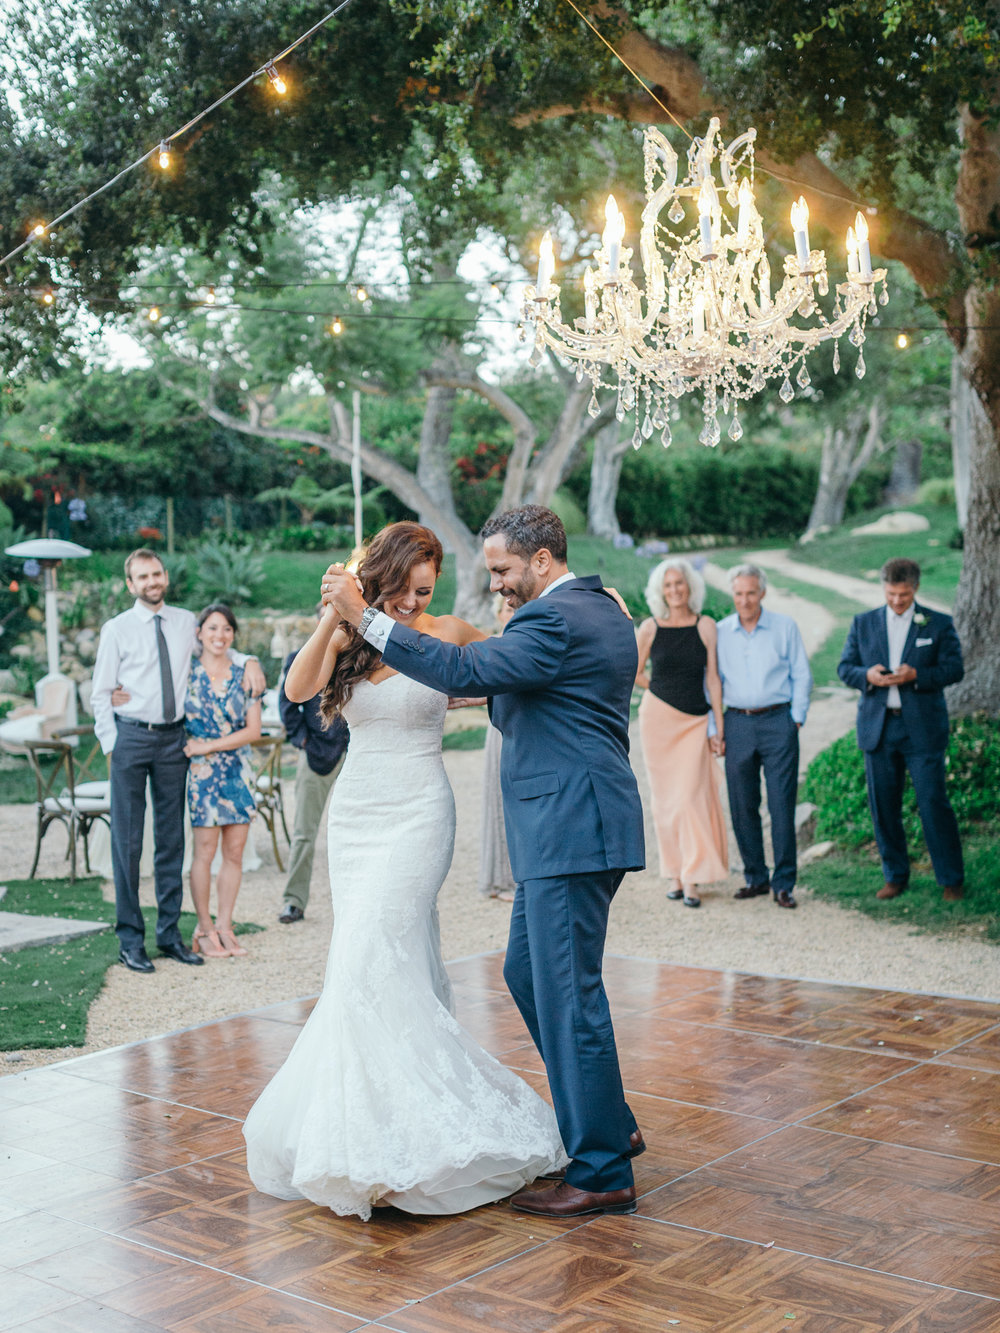 KRP-Aranza-And-Dawas-Wedding-603.jpg